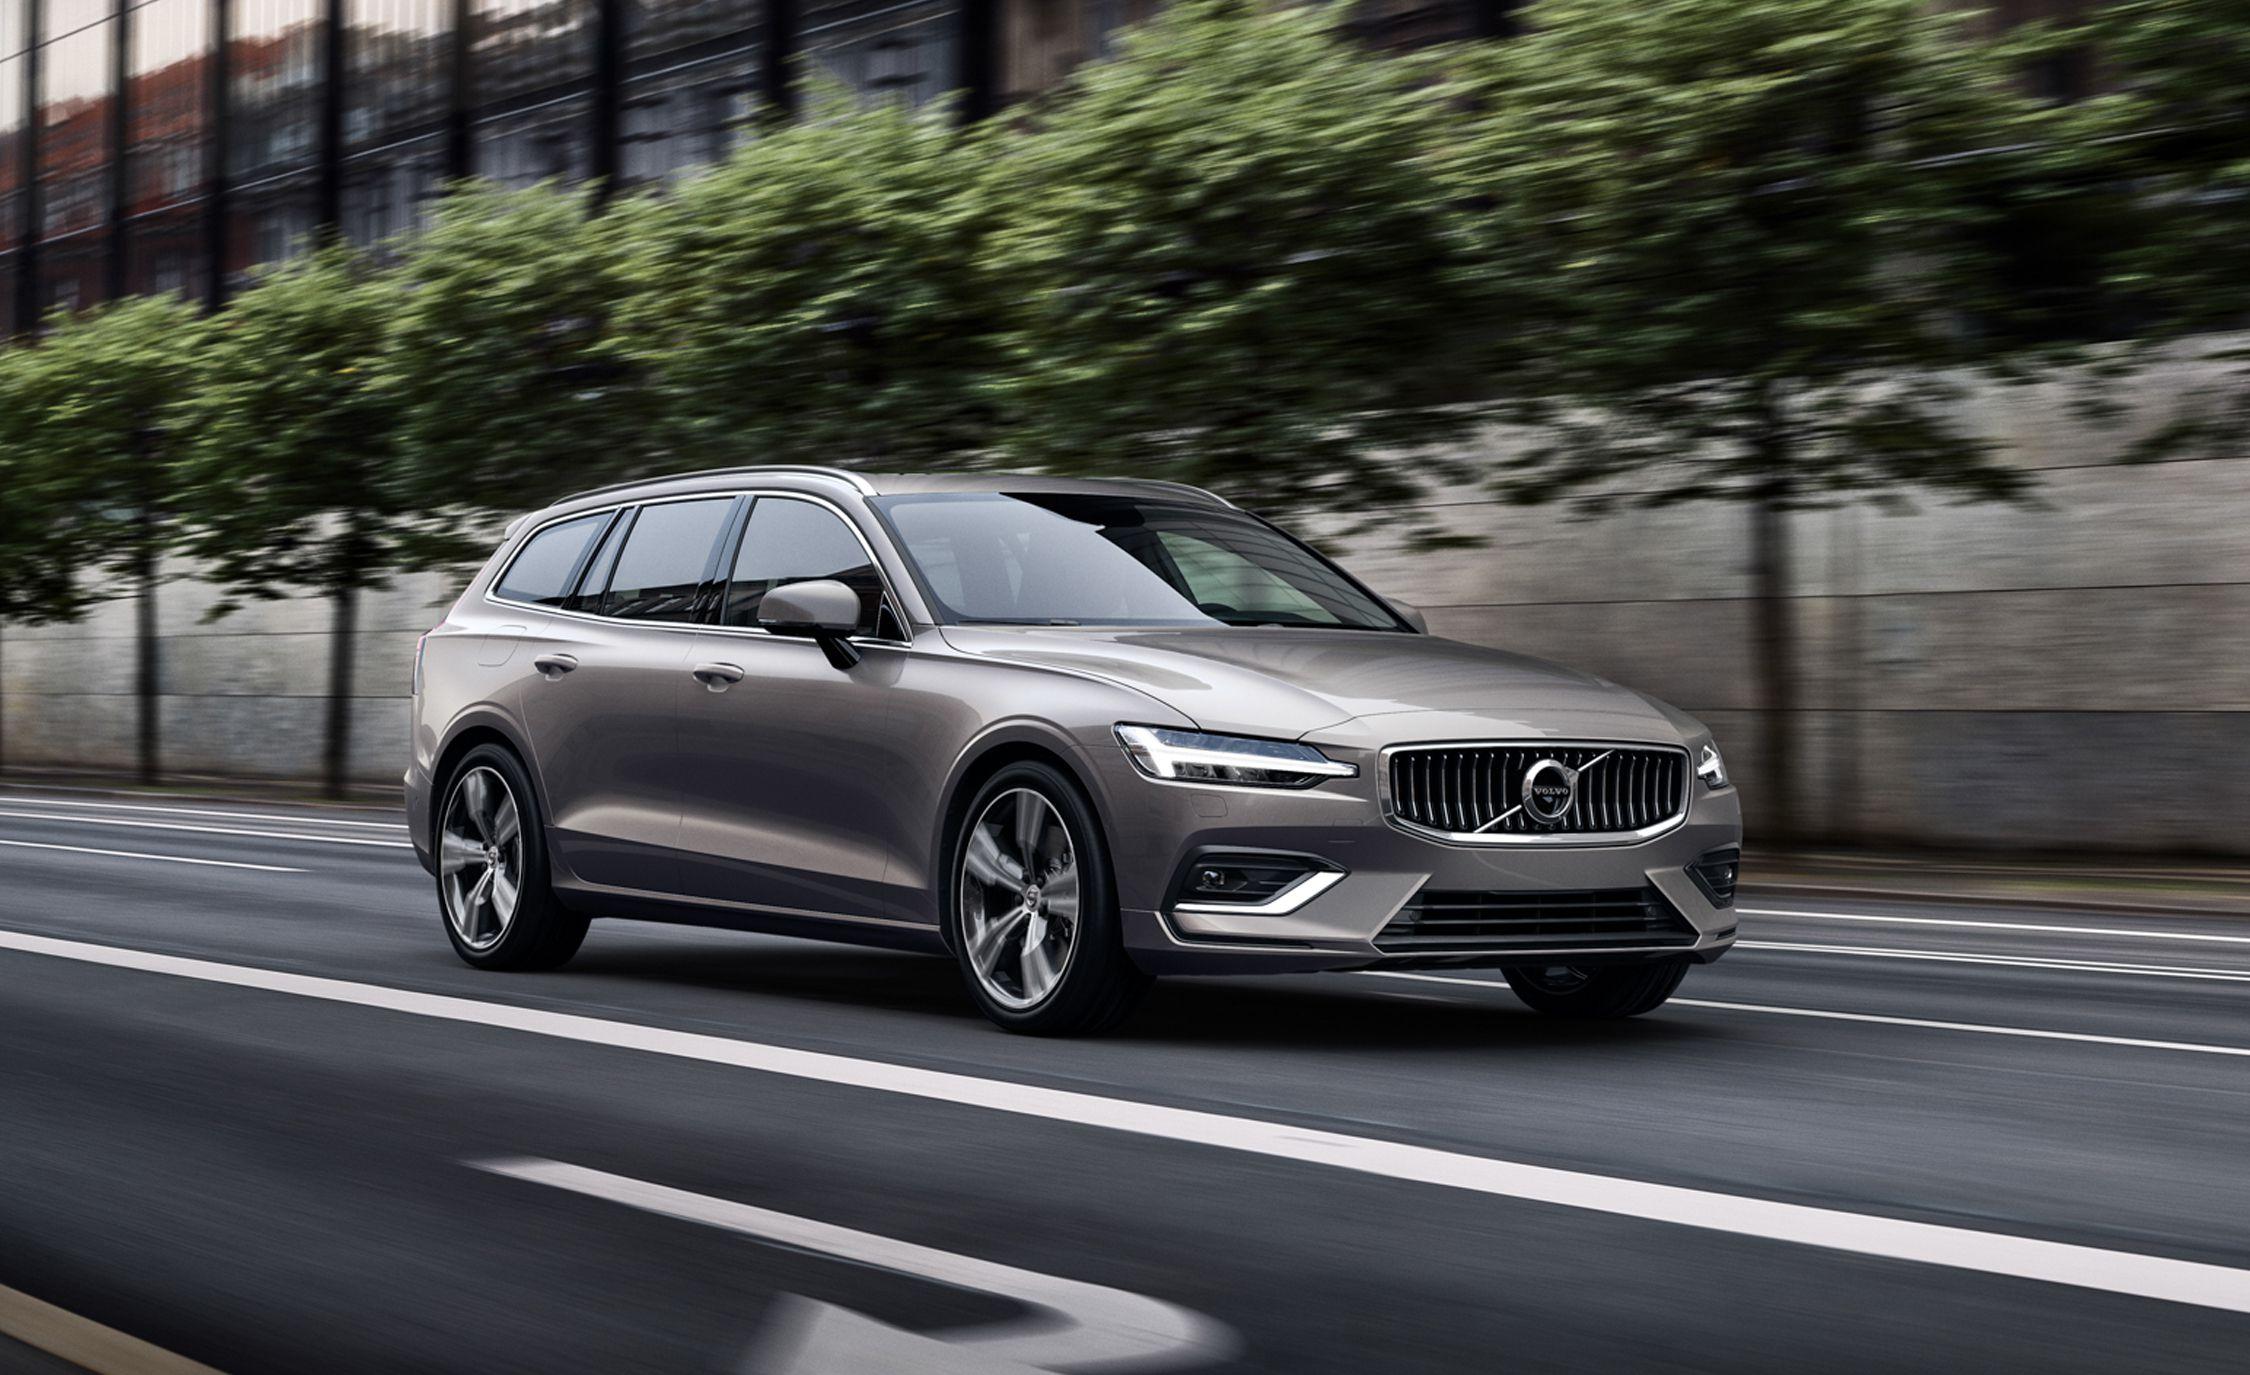 2019 Volvo V60 Cross Country >> The 2019 Volvo V60 Cross Country